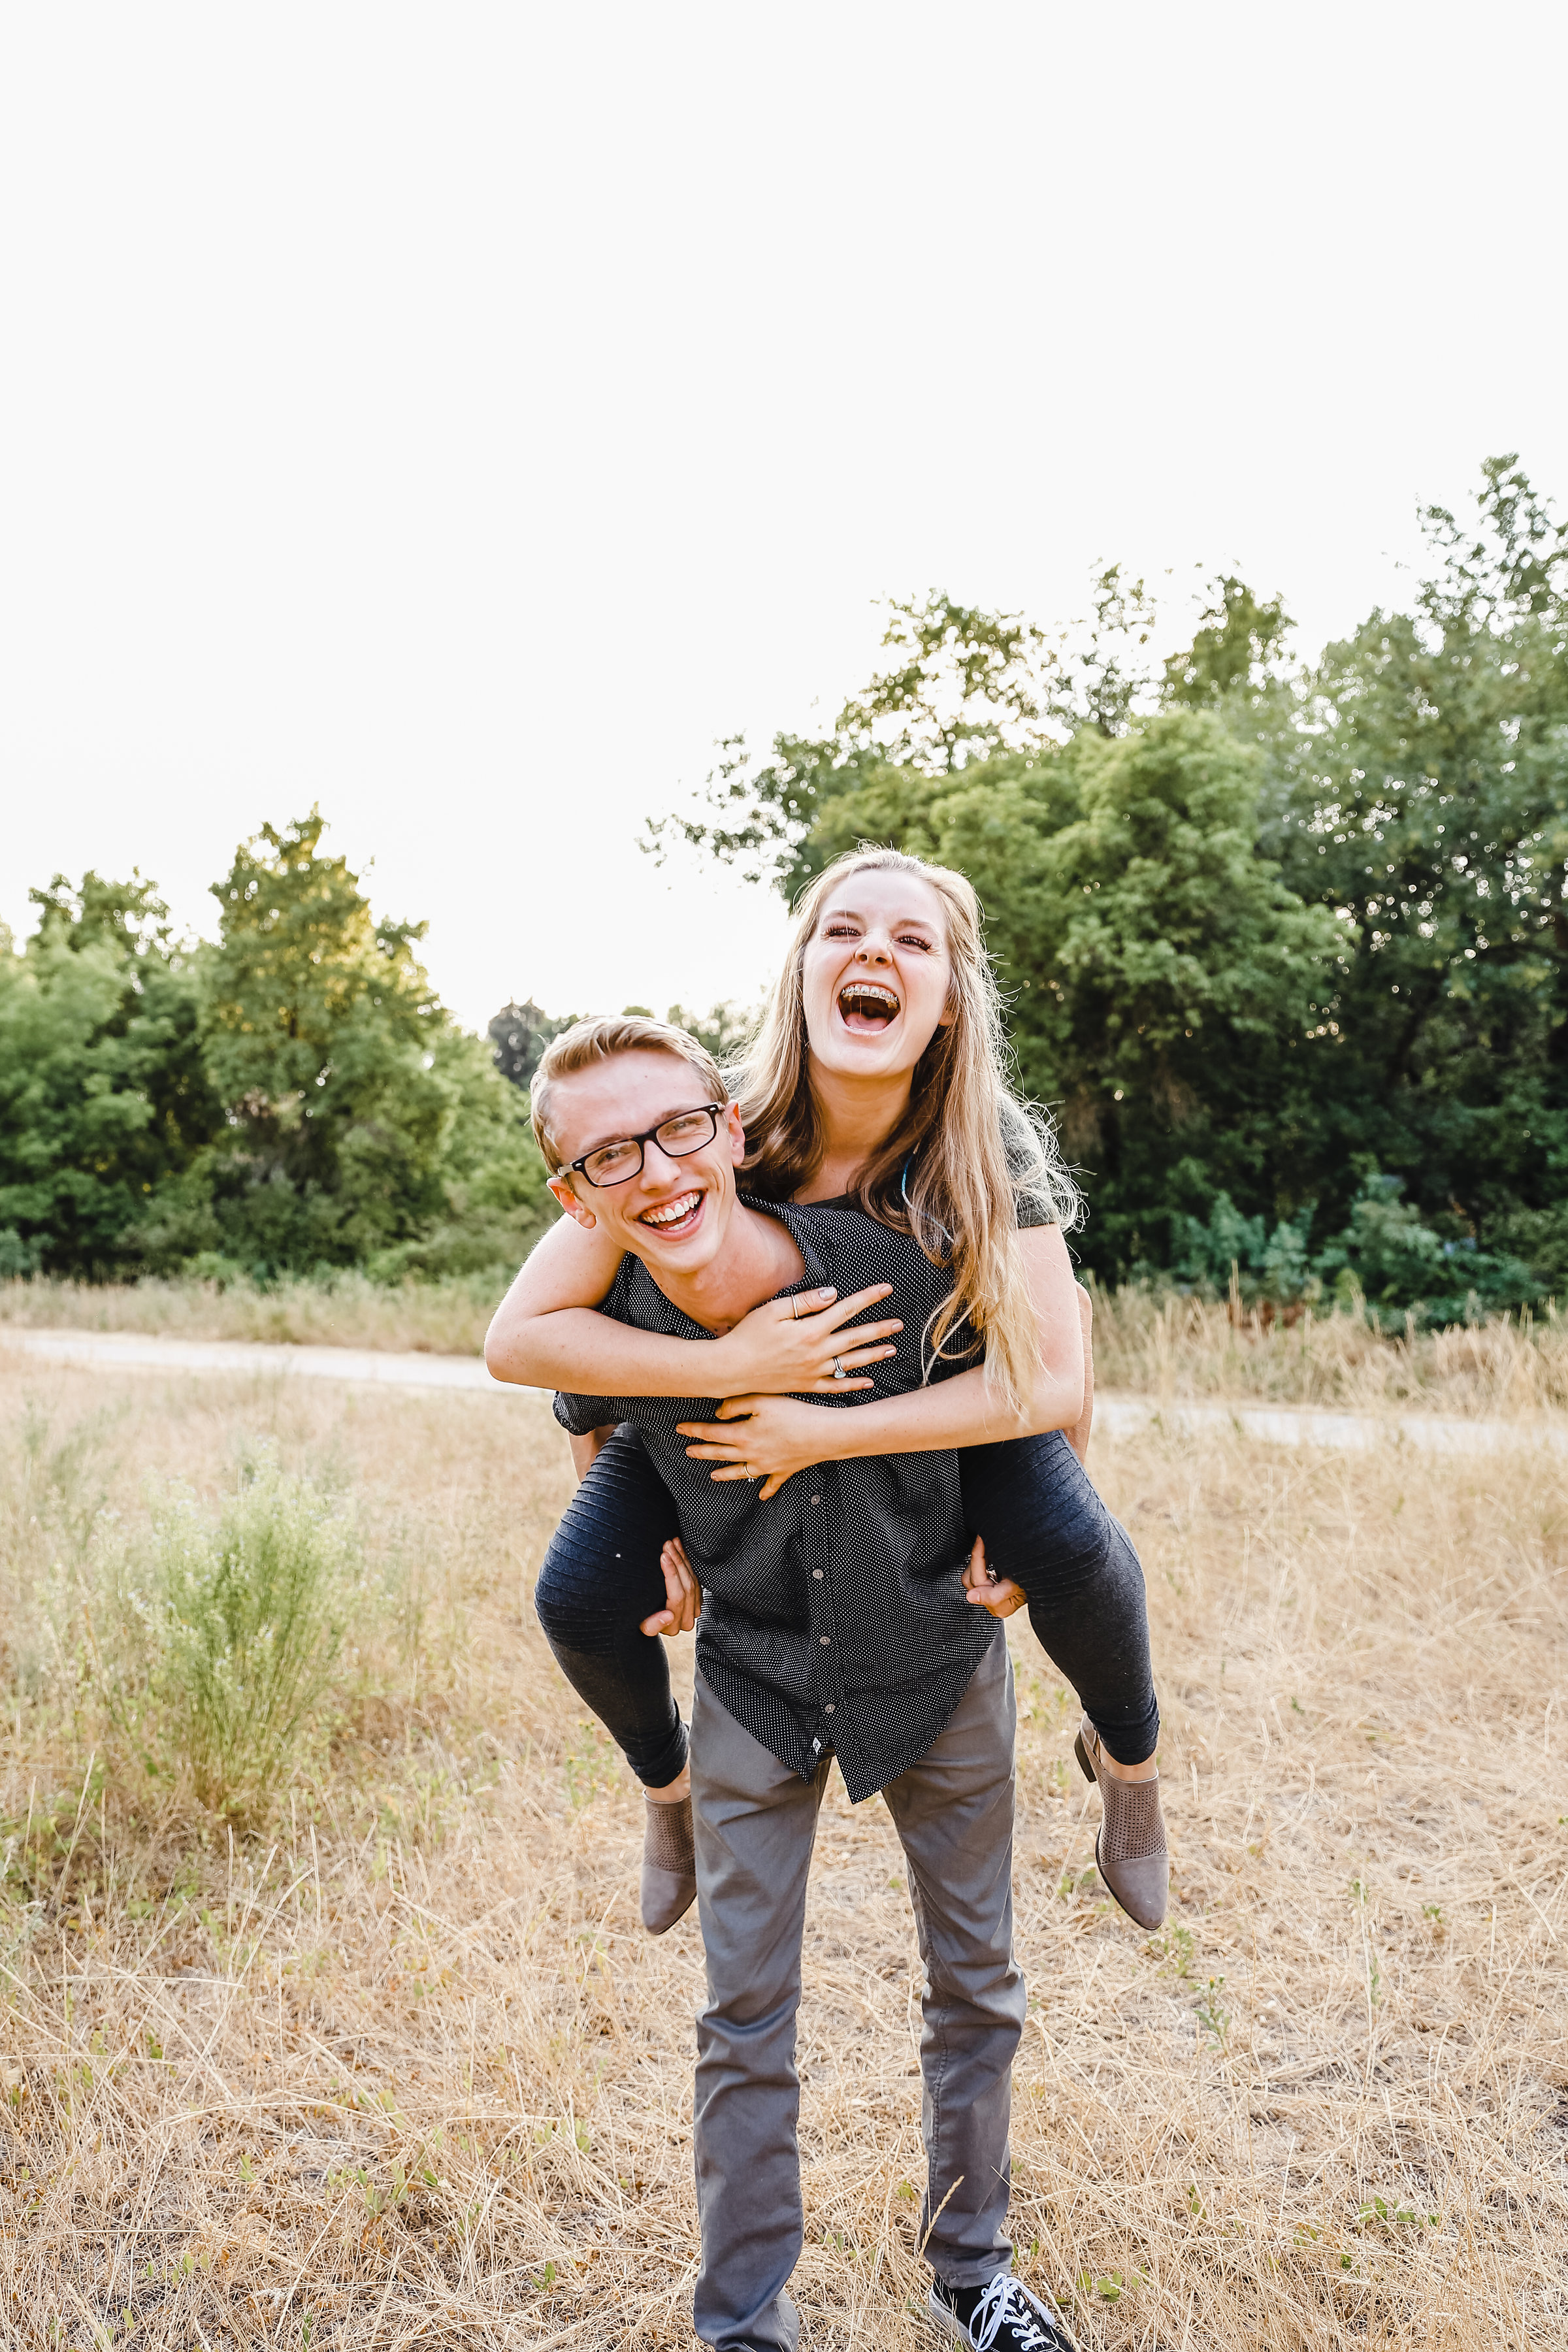 professional couples photographer in logan utah smiling laughing piggy back playful